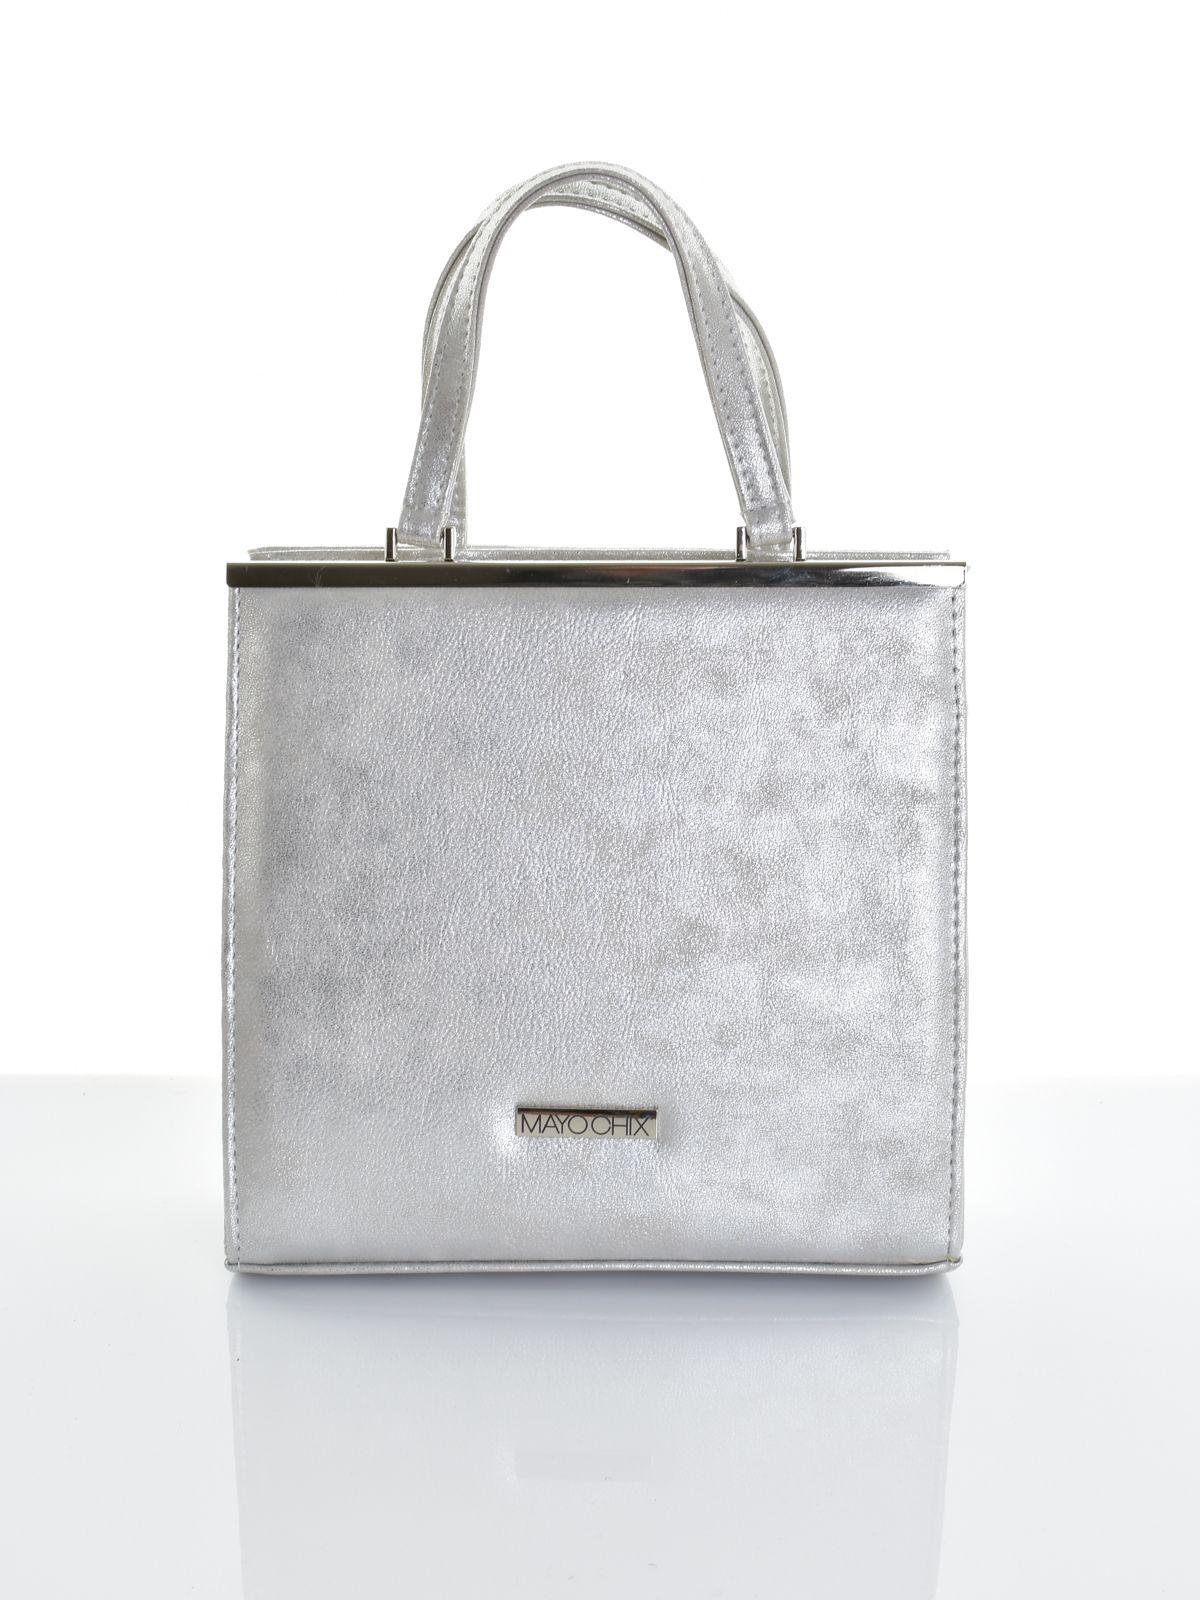 a351c3217efc Mayo Chix női táska EDITTA | Markasbolt.hu Hivatalos Mayo Chix ...